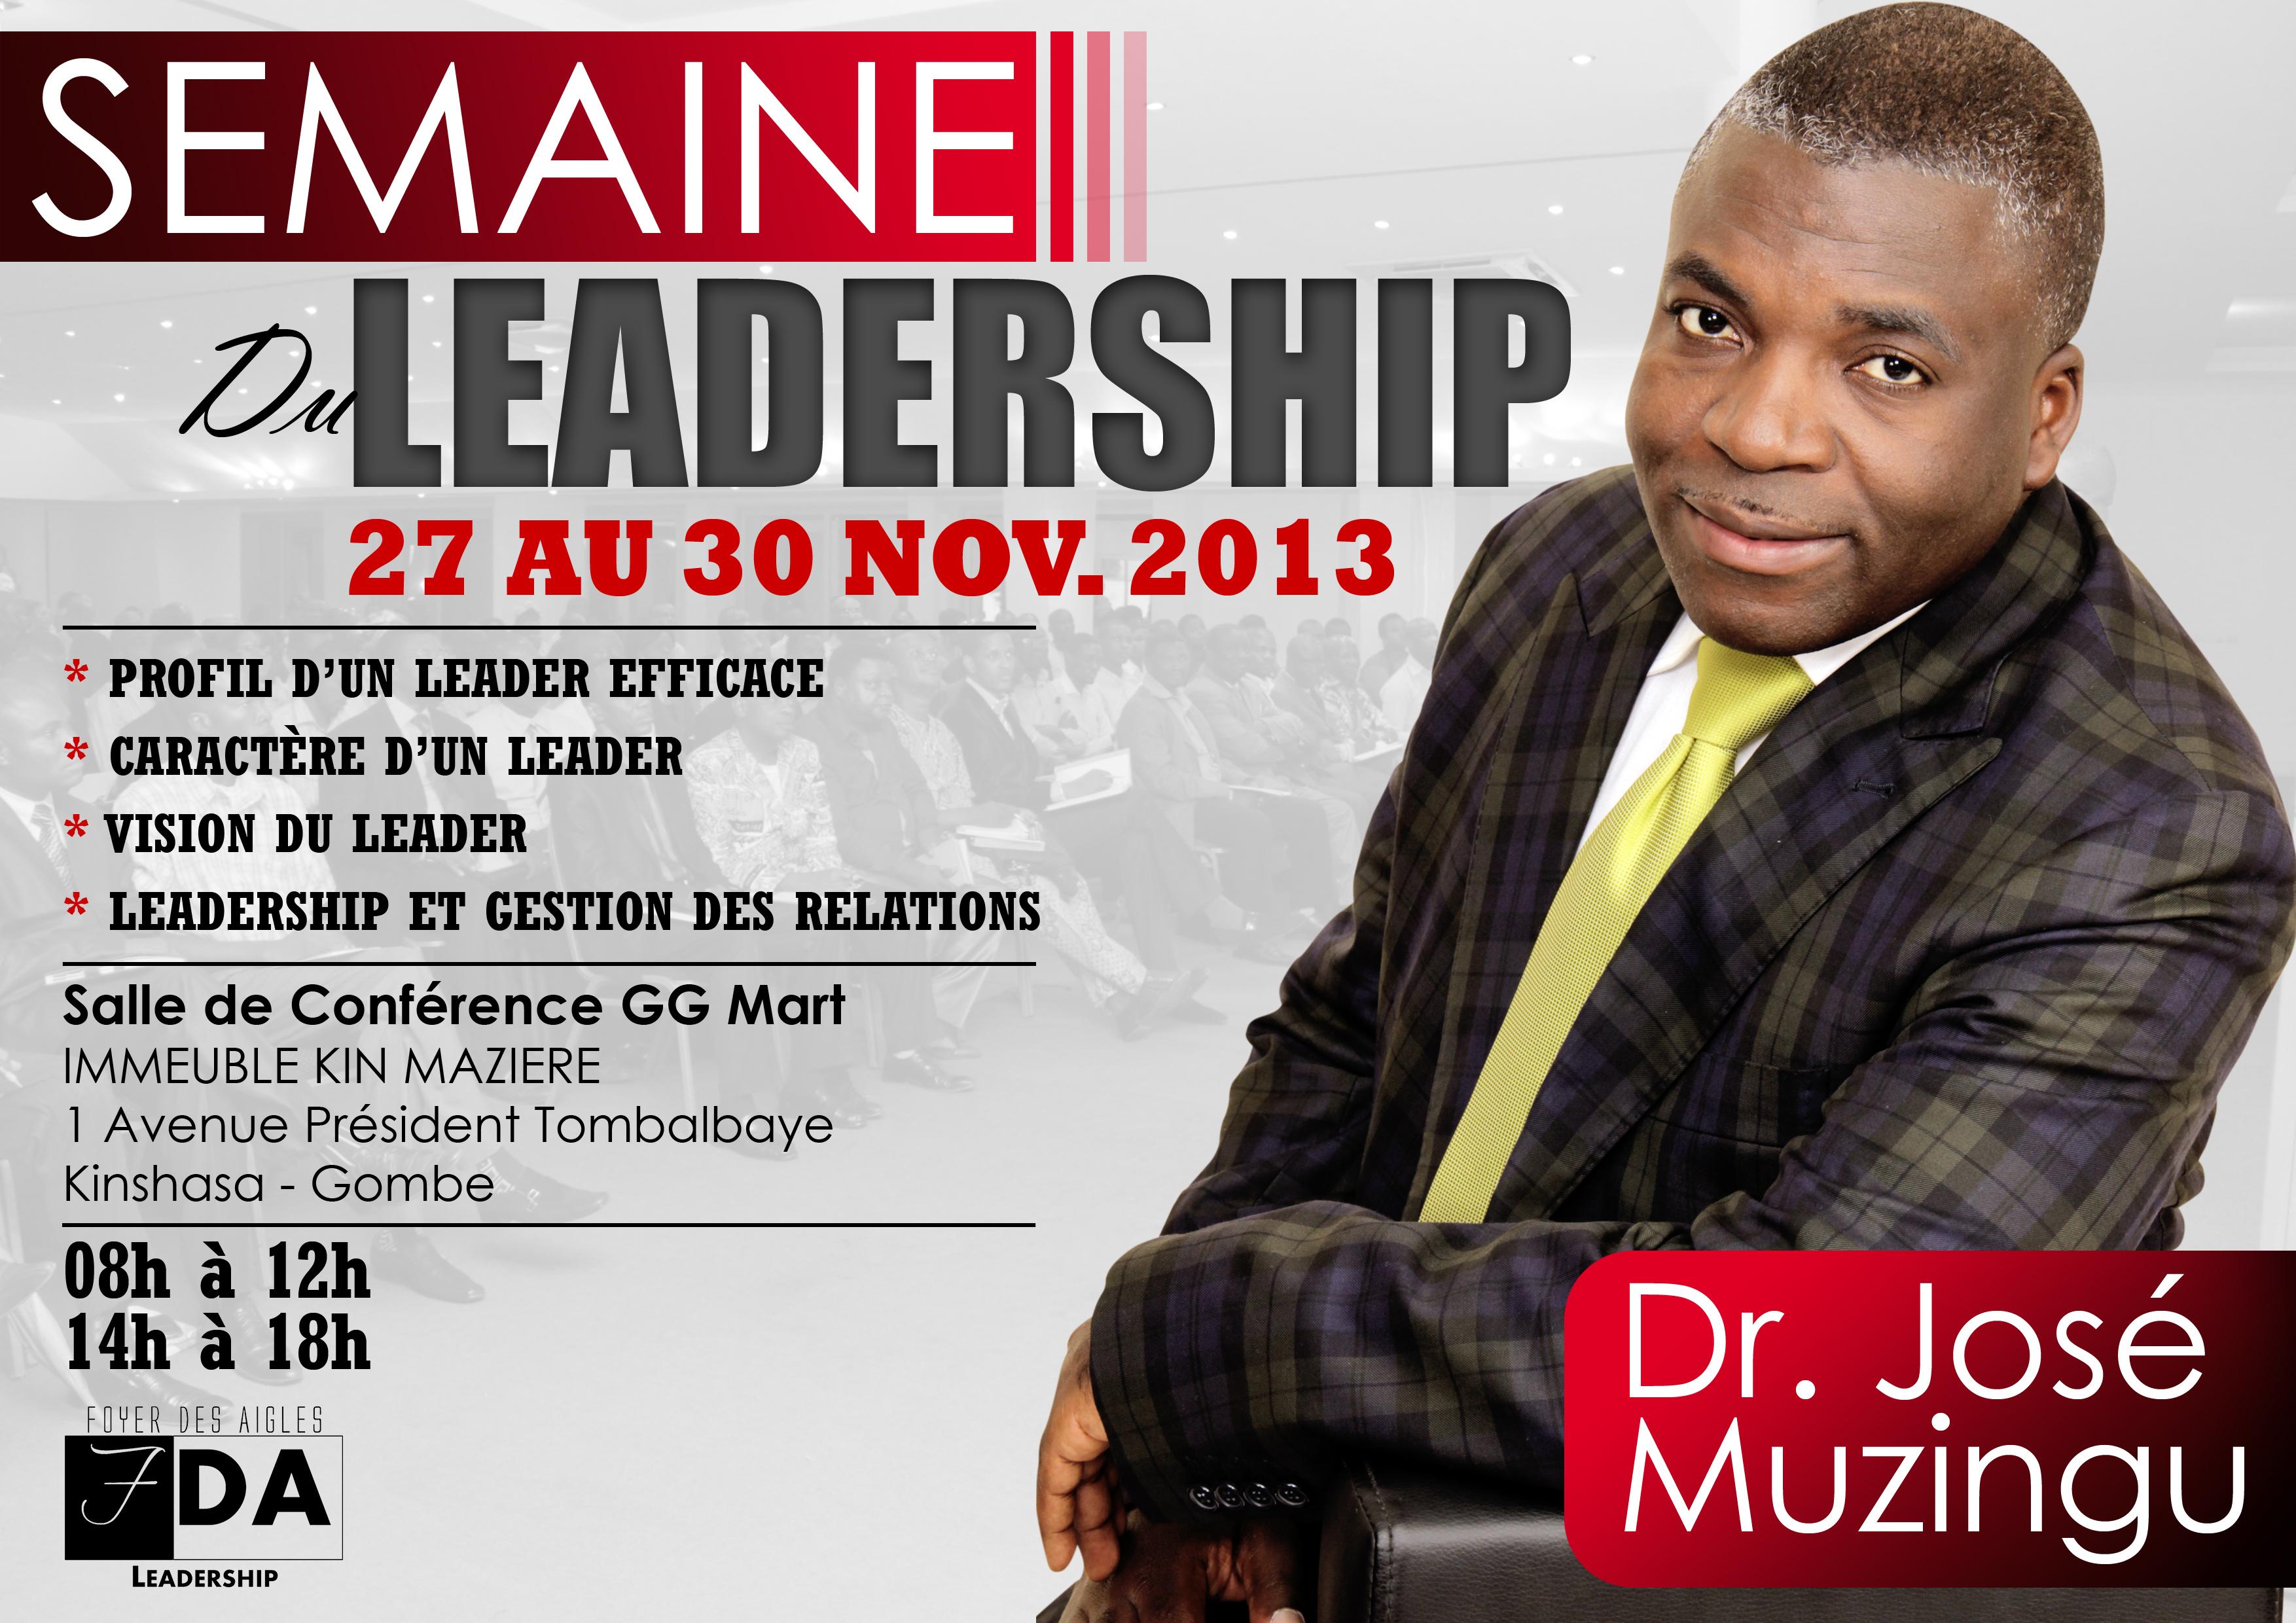 Leadership Week with DR. J MUZINGU